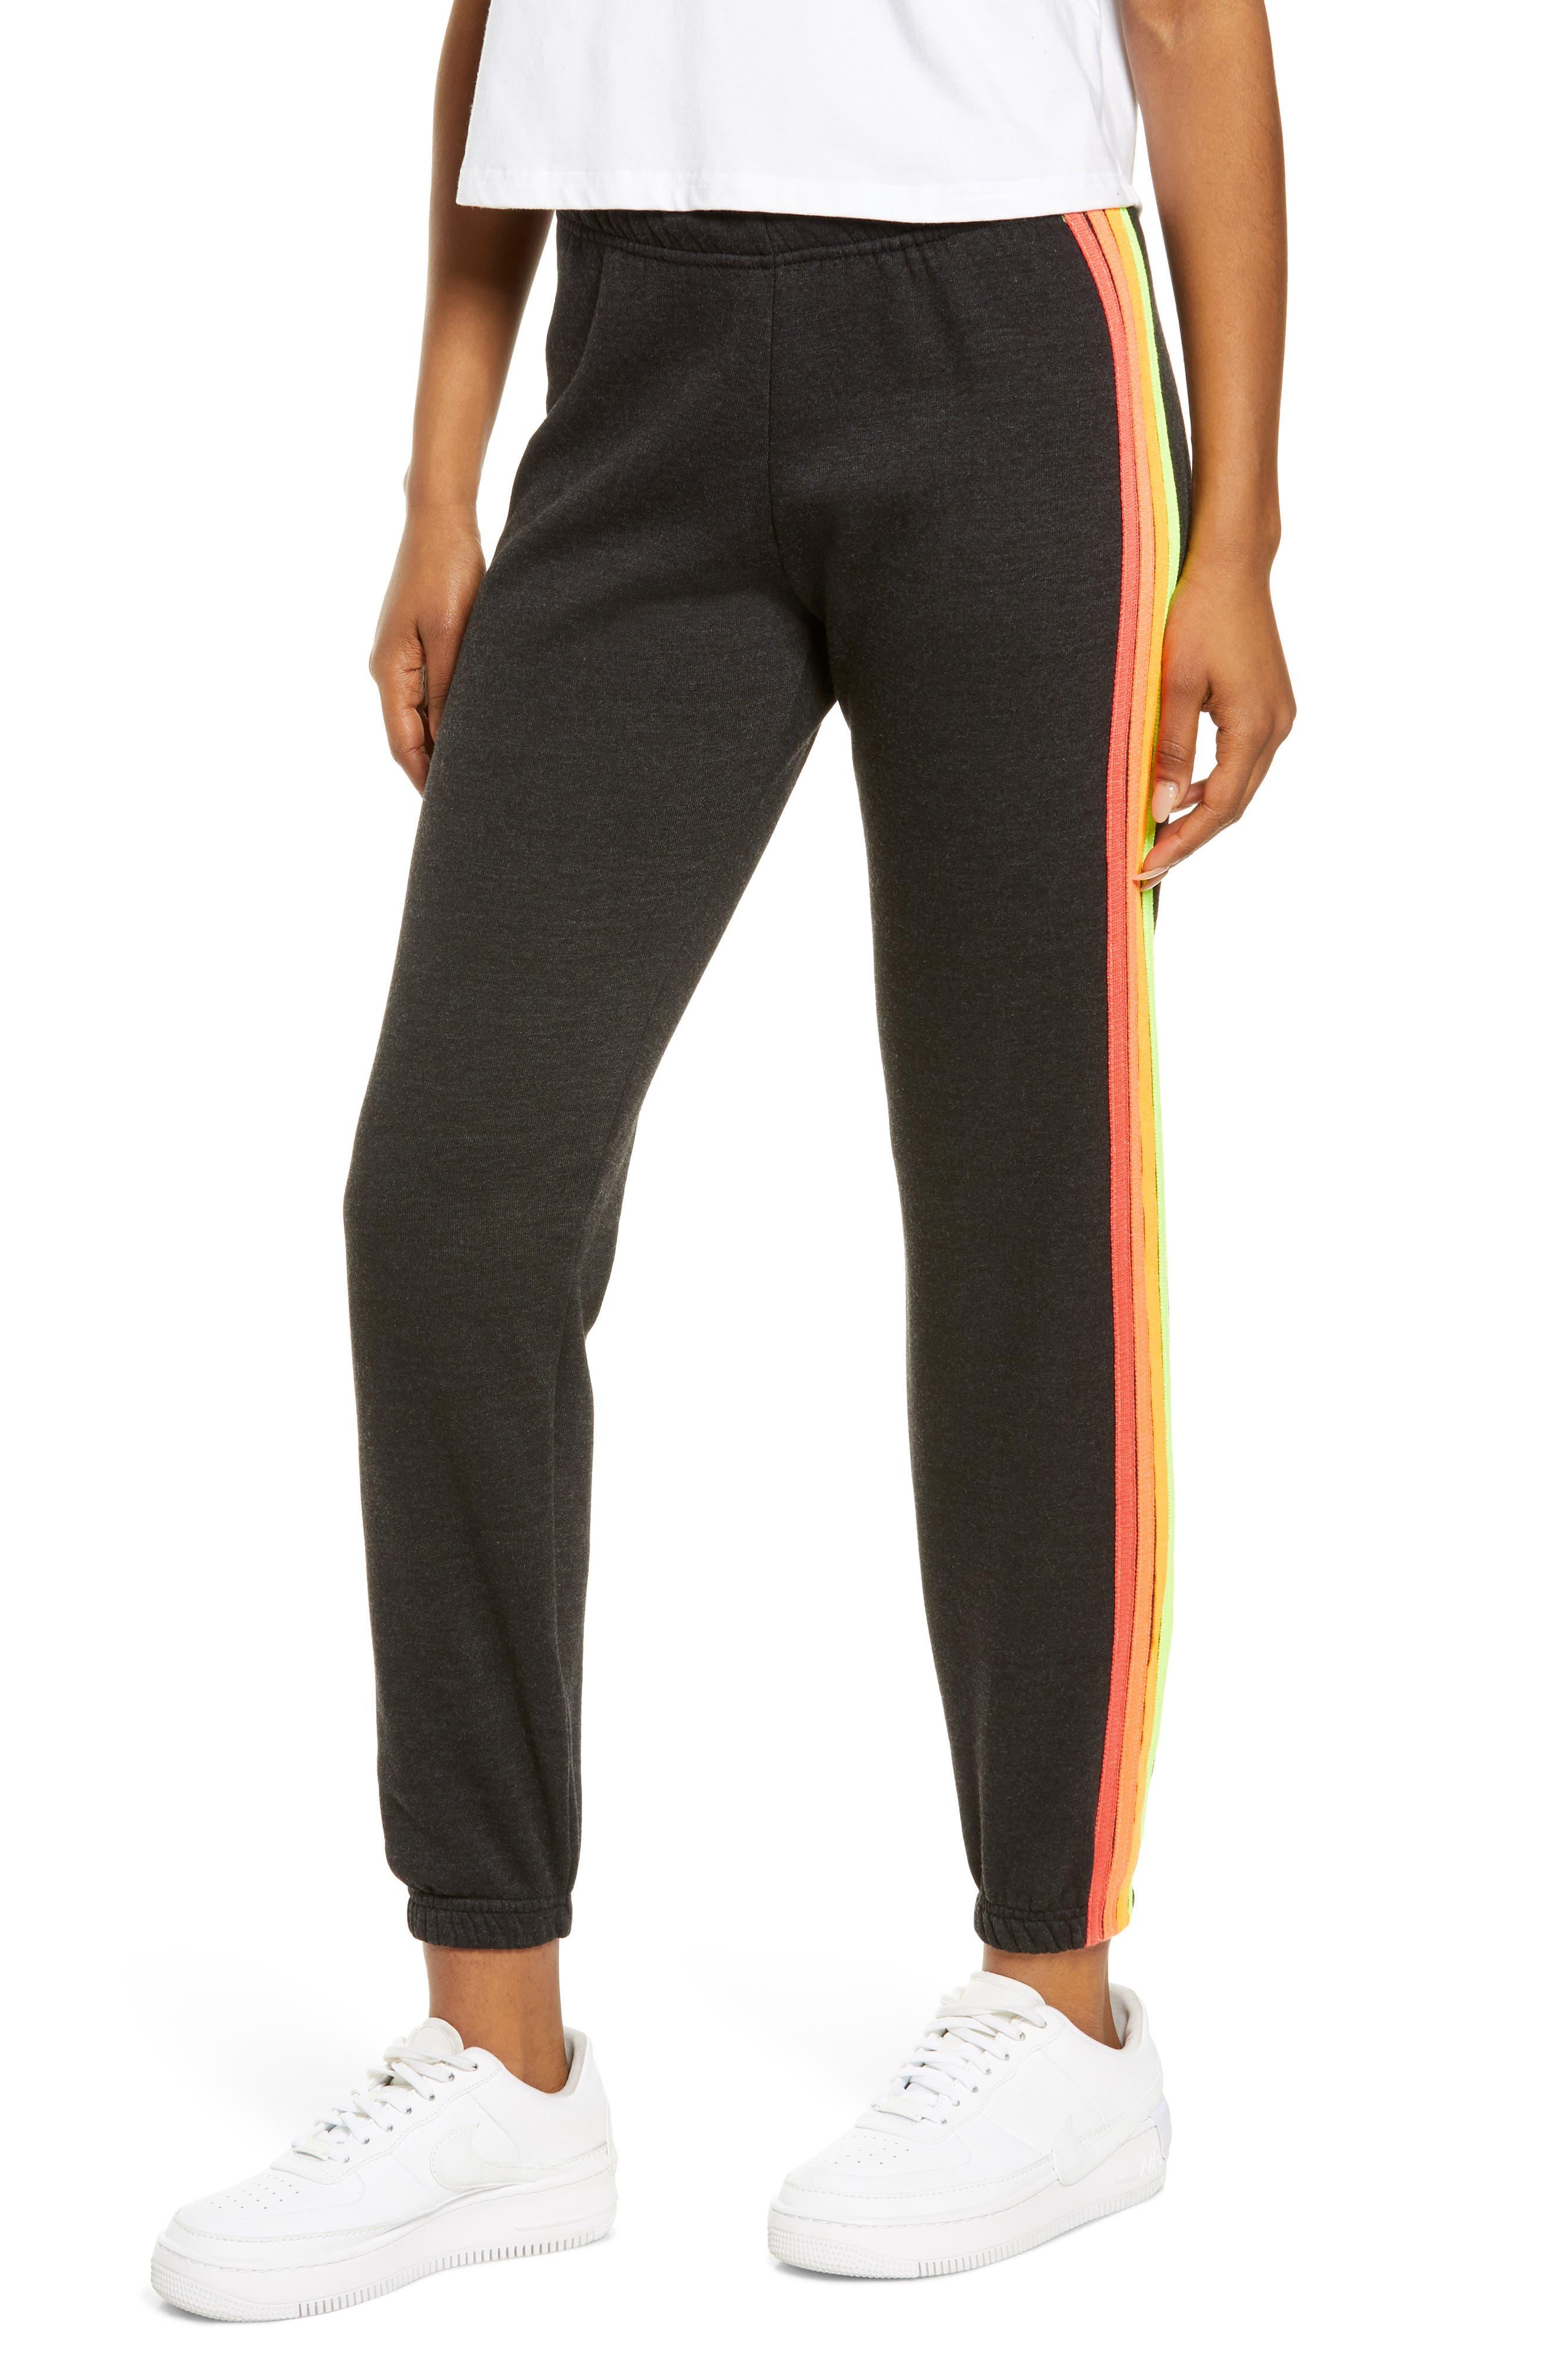 Four Stripe Sweatpants